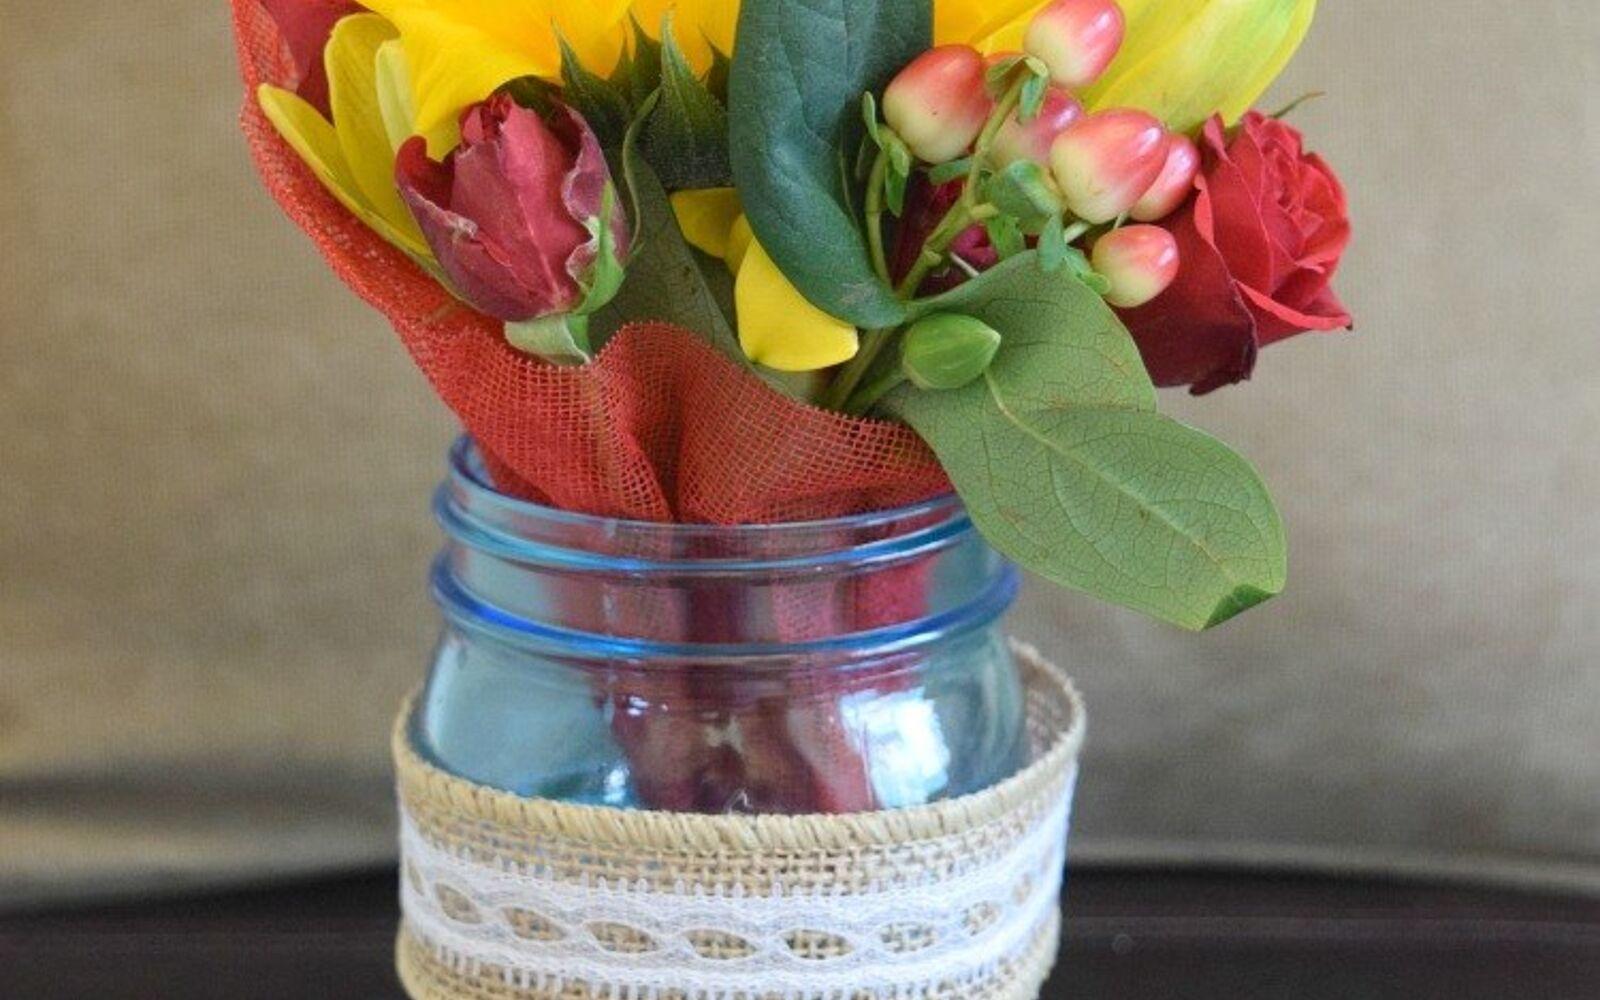 s 30 great mason jar ideas you have to try, Gorgeous Mason Jar Vase